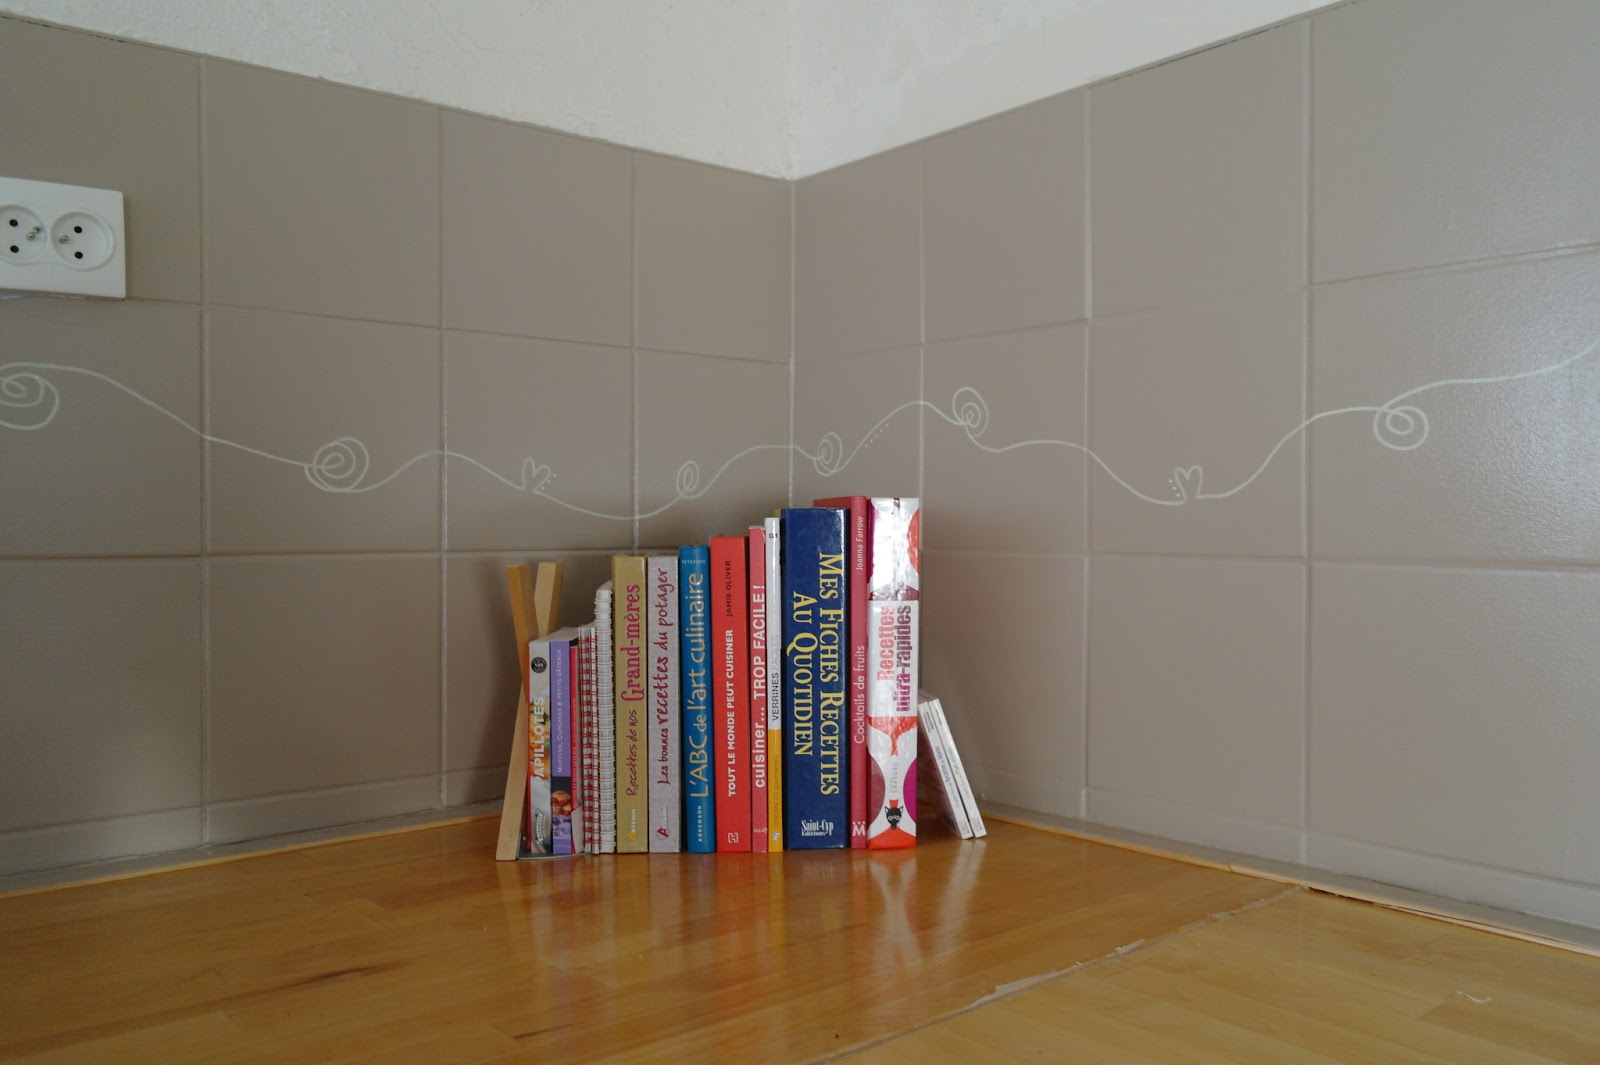 Carrelage imitation beton cire leroy merlin renovation prix m2 amiens sai - Carrelage beton cire leroy merlin ...